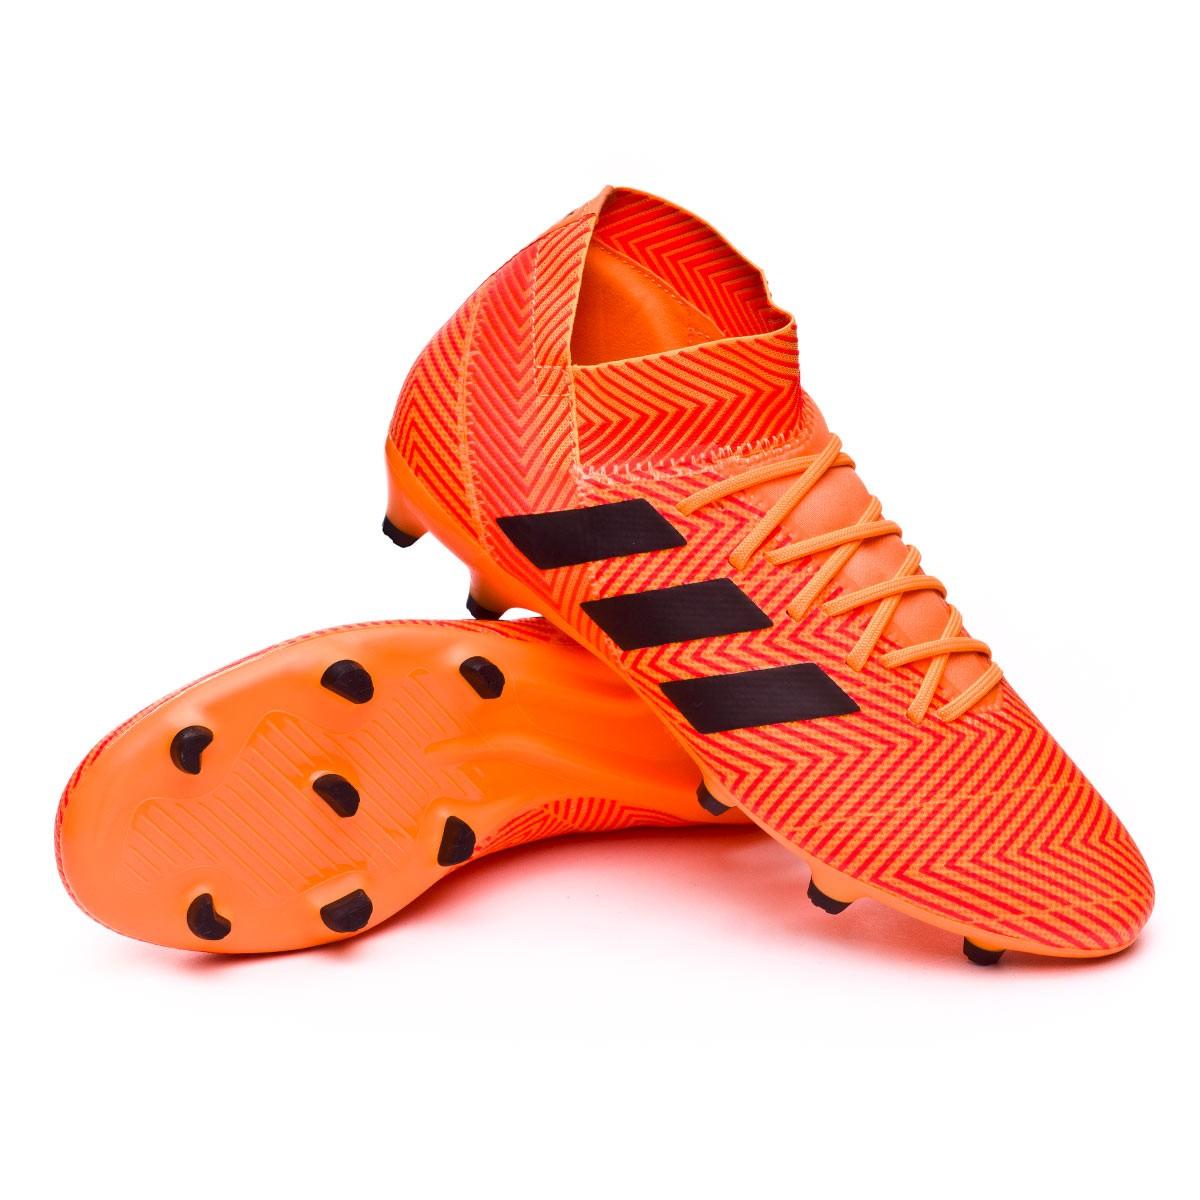 best website 98e26 2ac31 adidas Nemeziz 18.3 FG Boot